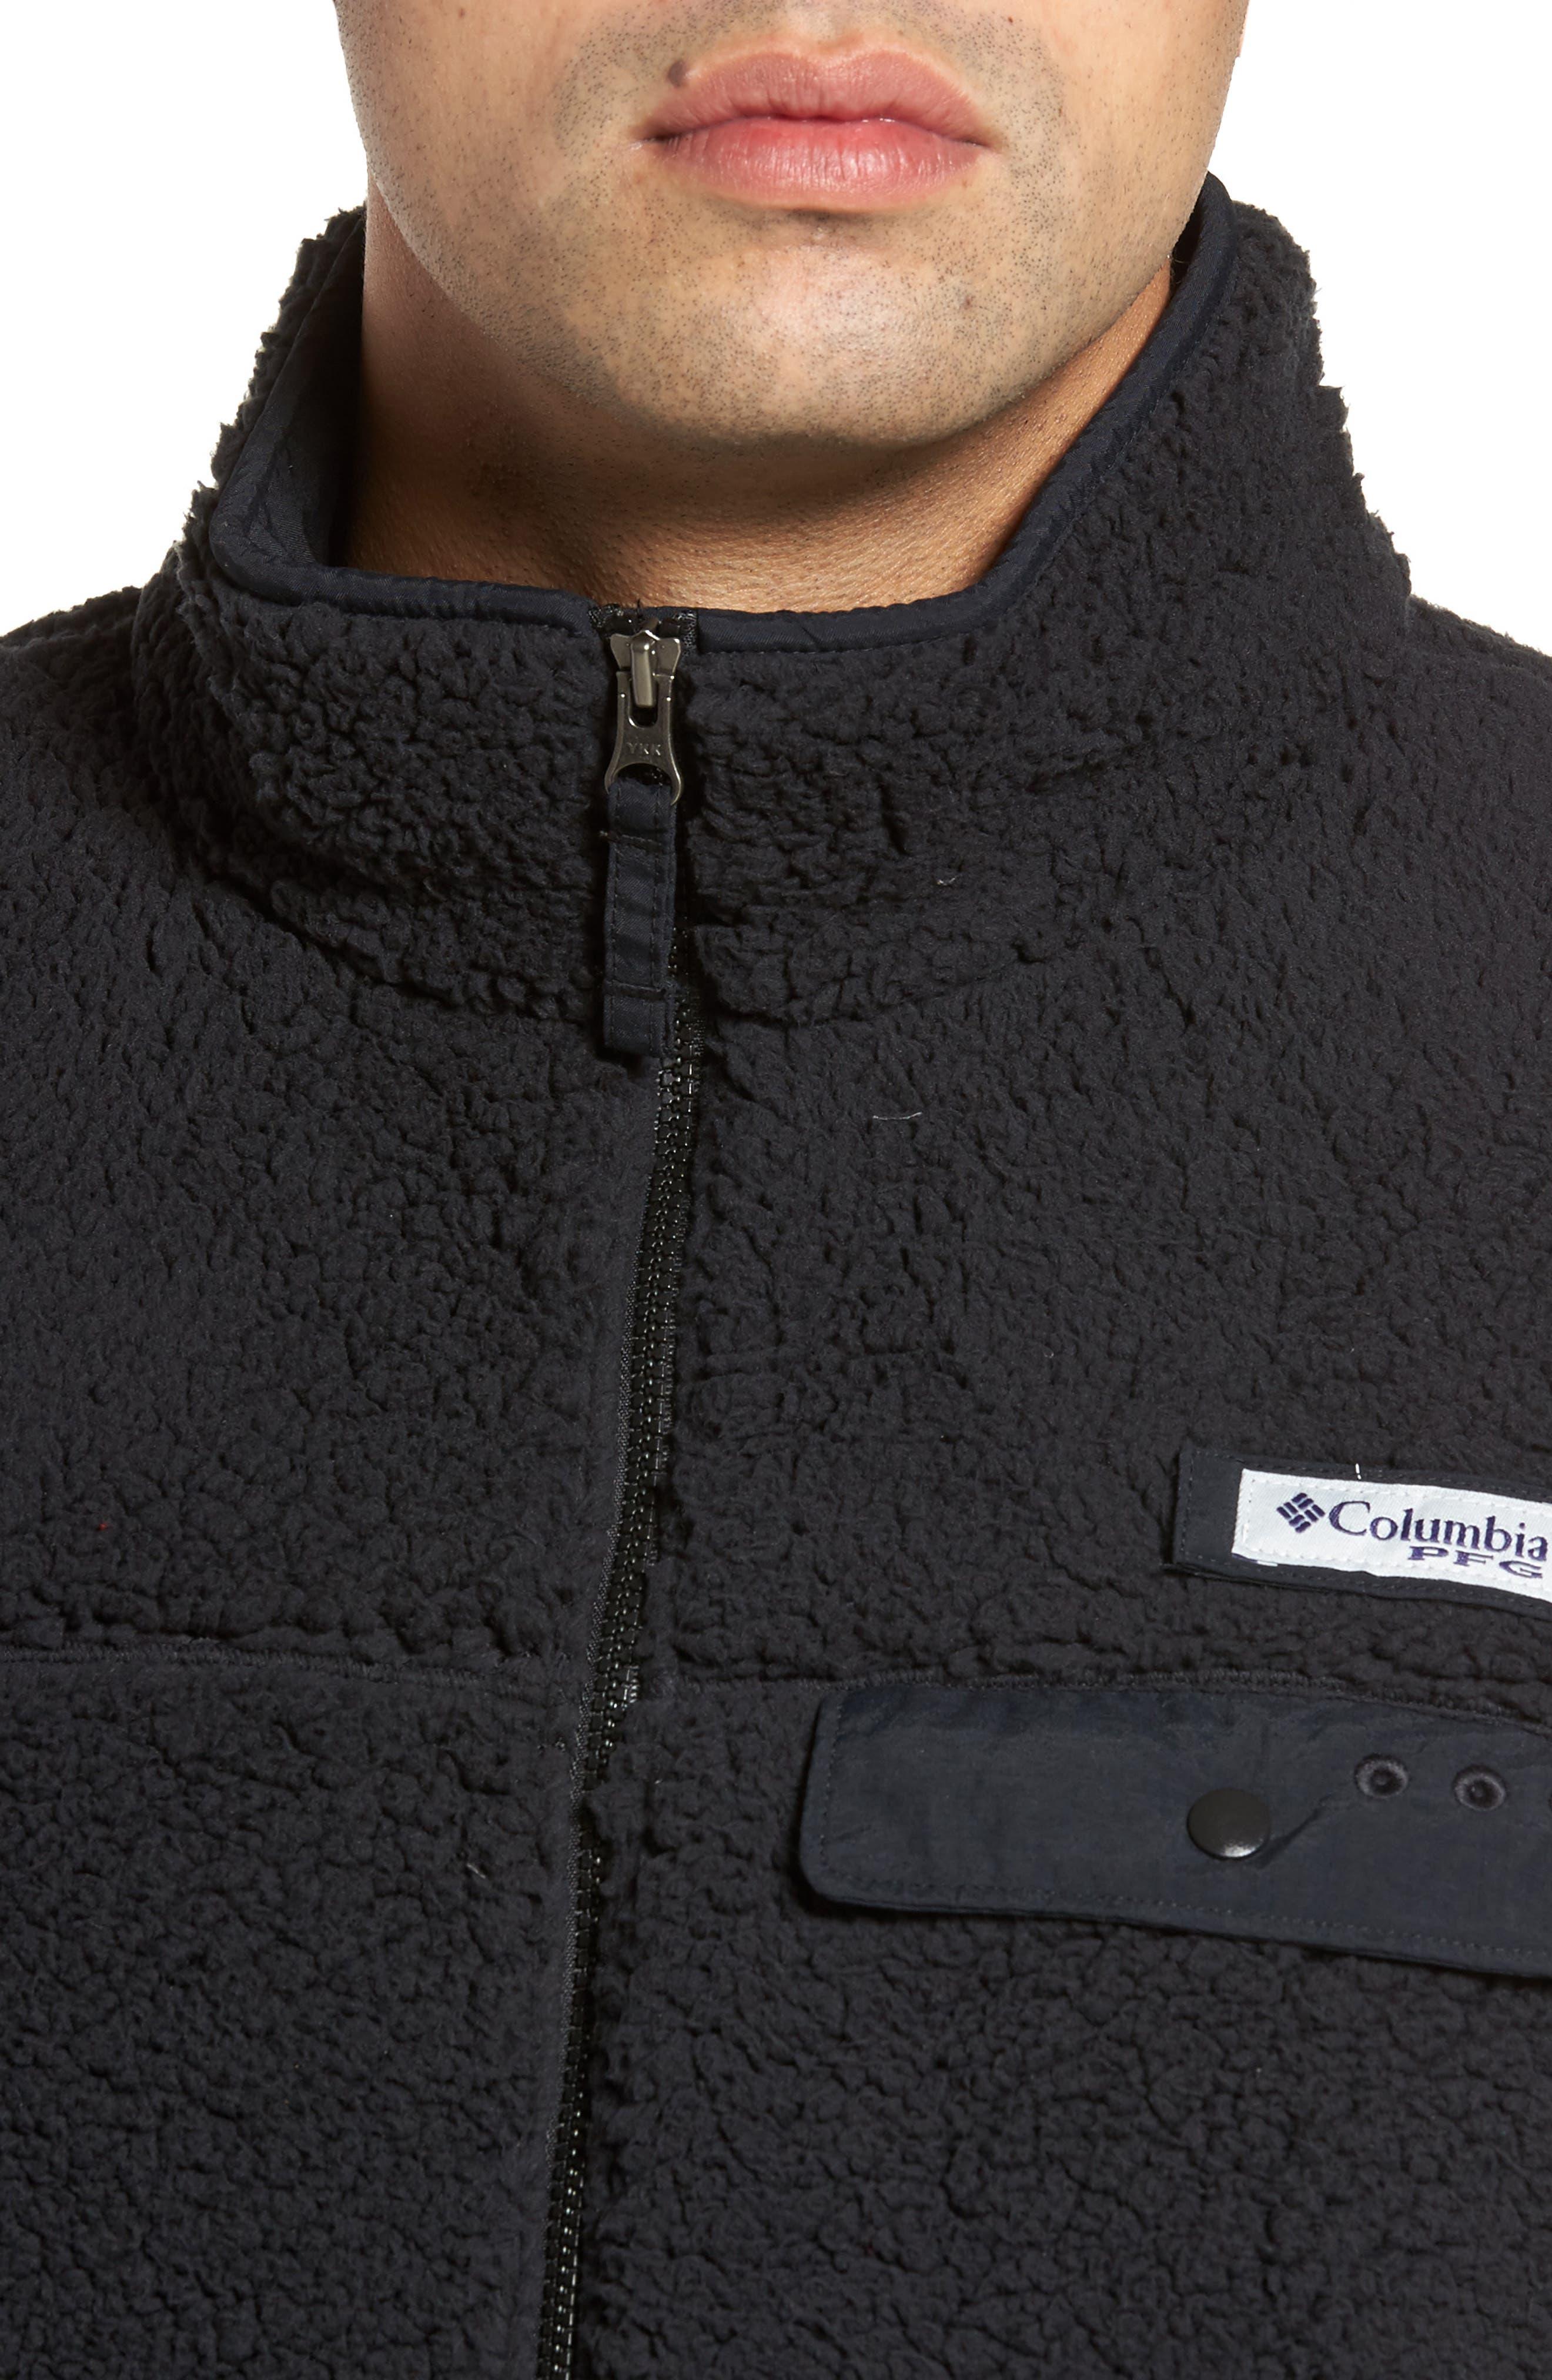 Harborside Fleece Jacket,                             Alternate thumbnail 16, color,